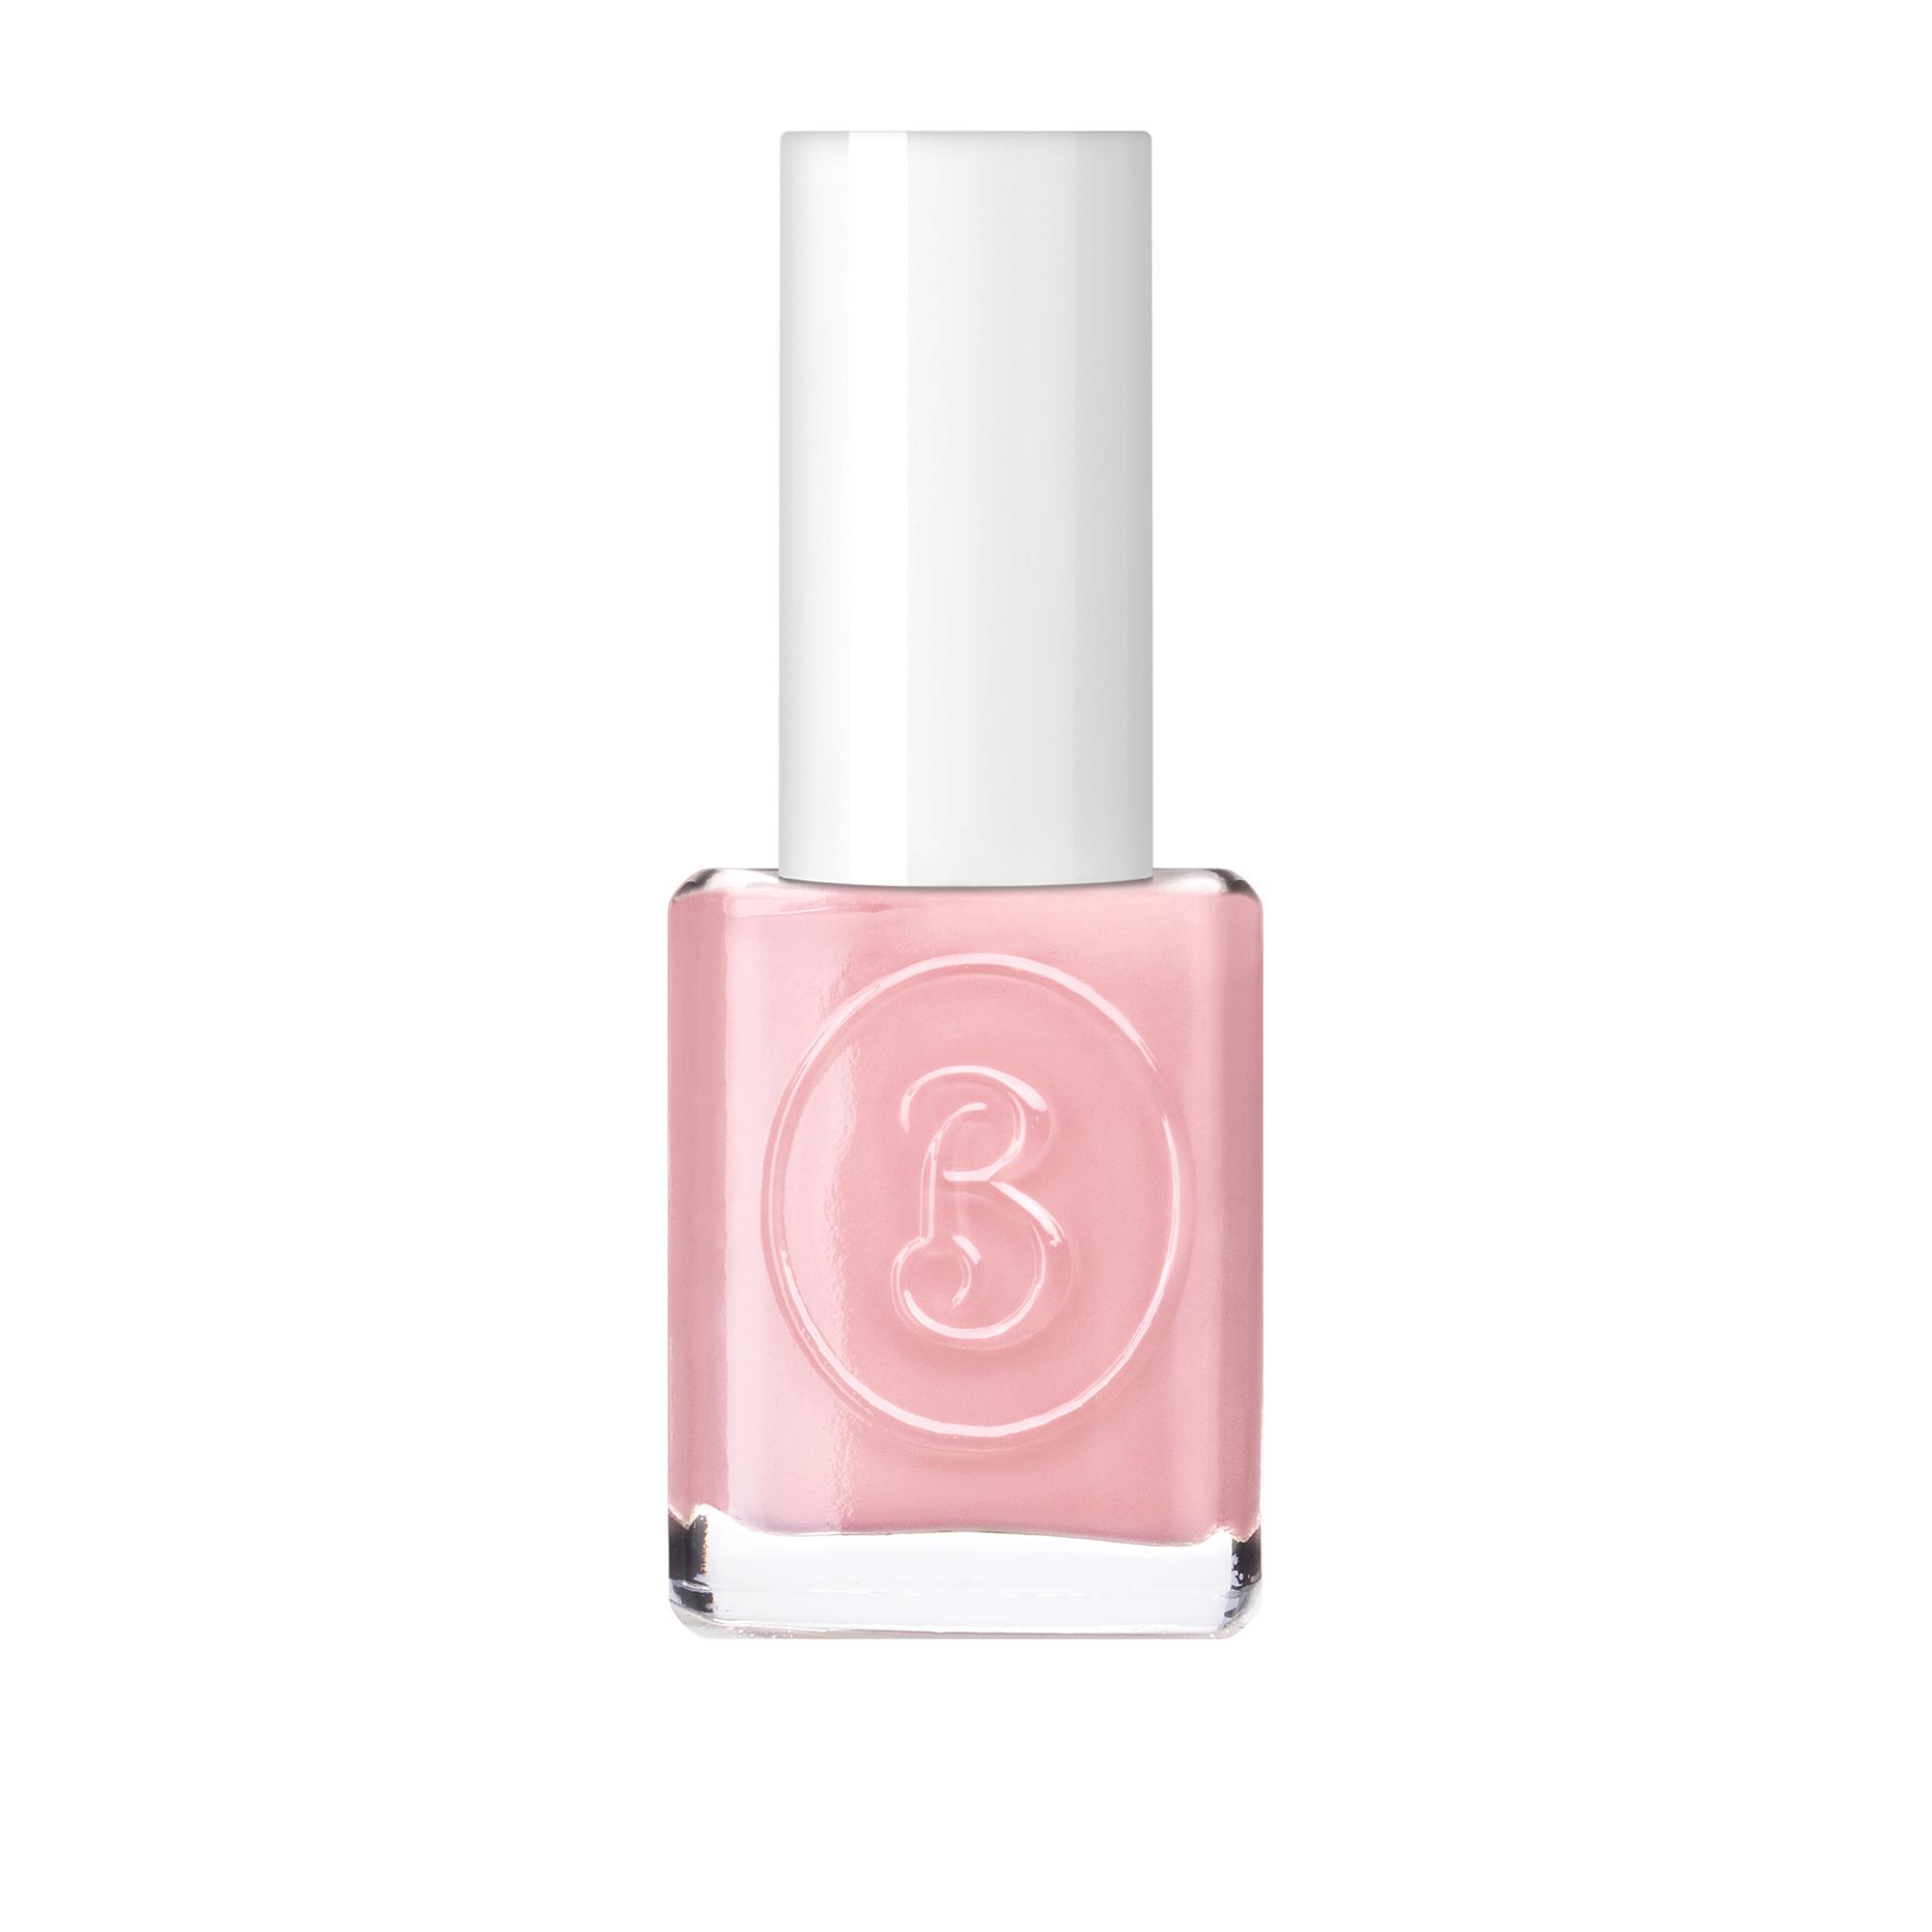 BERENICE Лак для ногтей розовый французский тон 36 pink french / BERENICE 16 мл